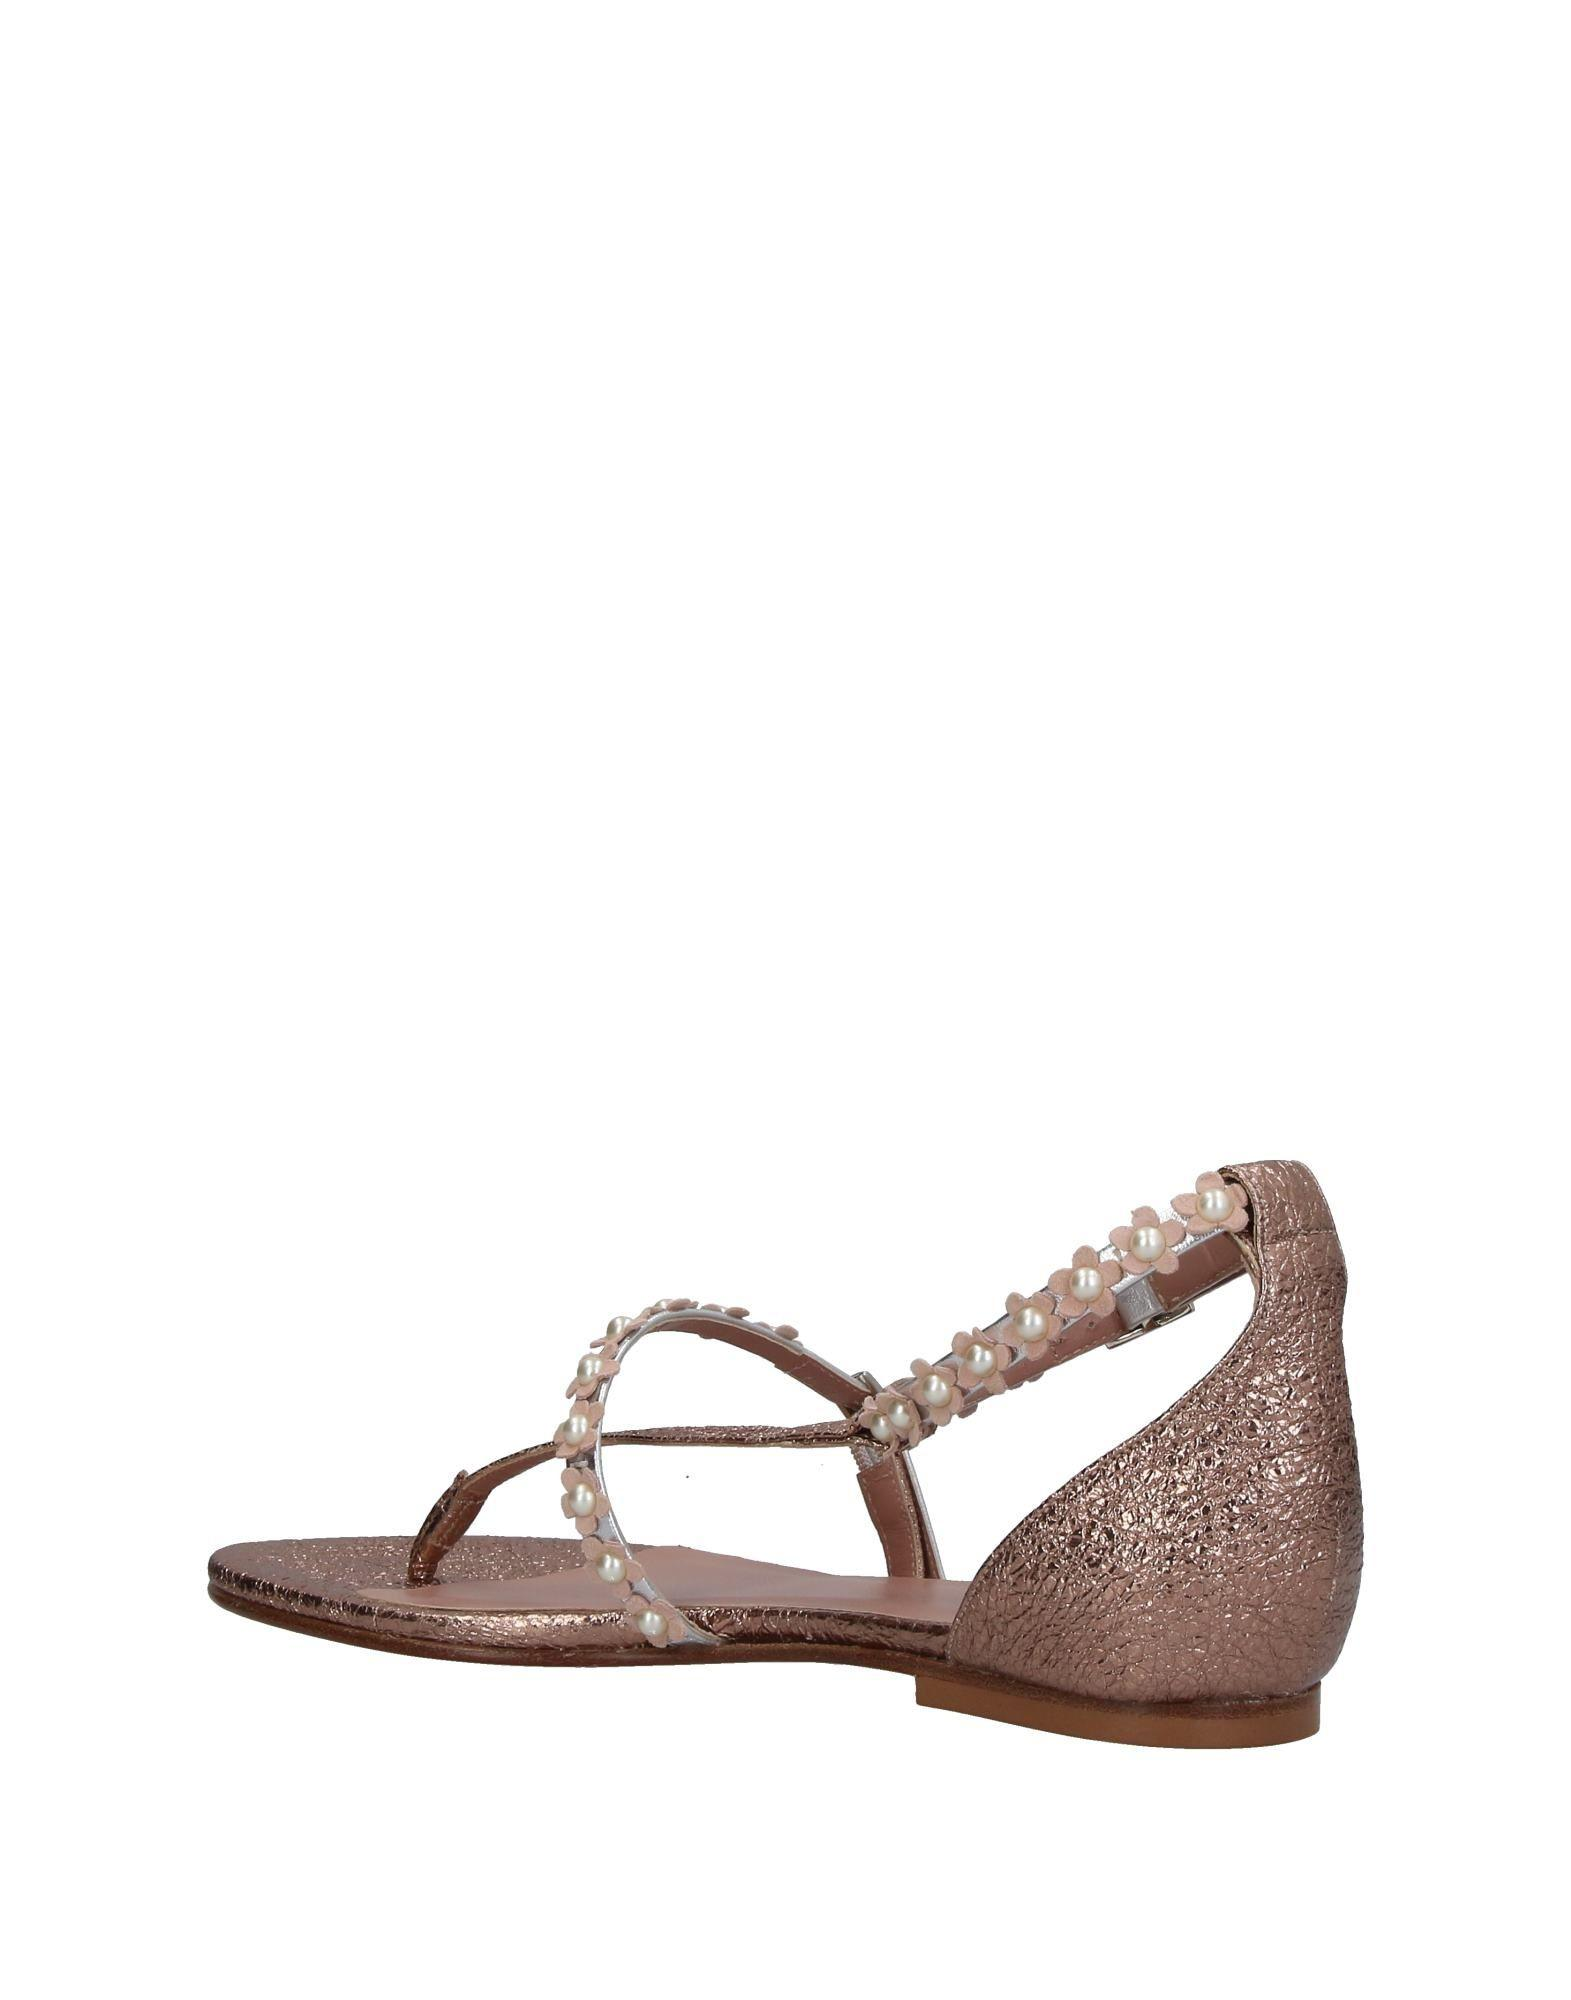 Chaussures - Sandales Post Orteils Gianna Meliani fsjrtTh91C